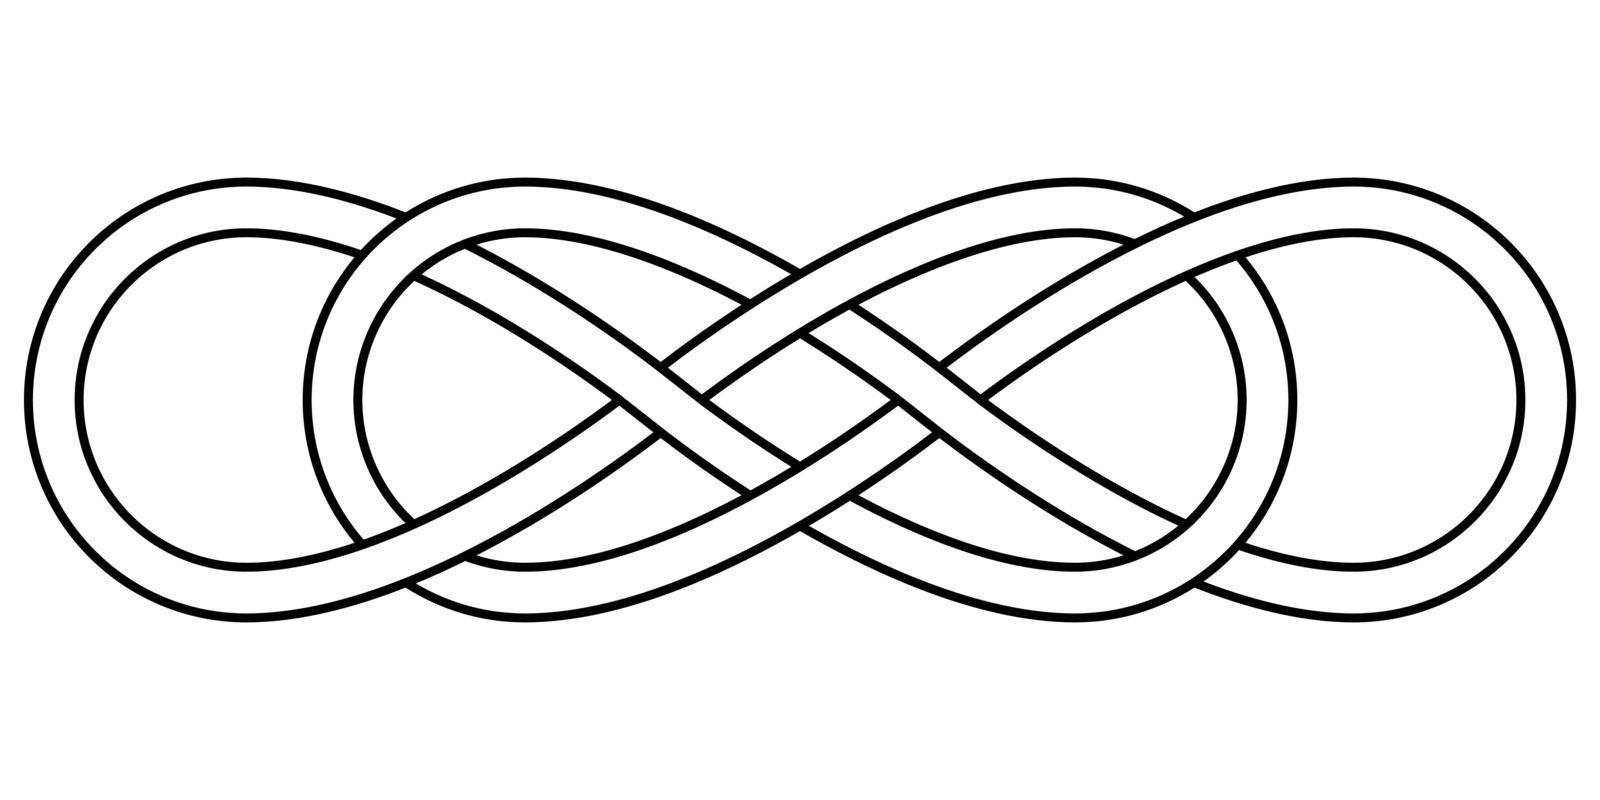 Double knot infinity sign vector double infinity logo tattoo by koksikoks